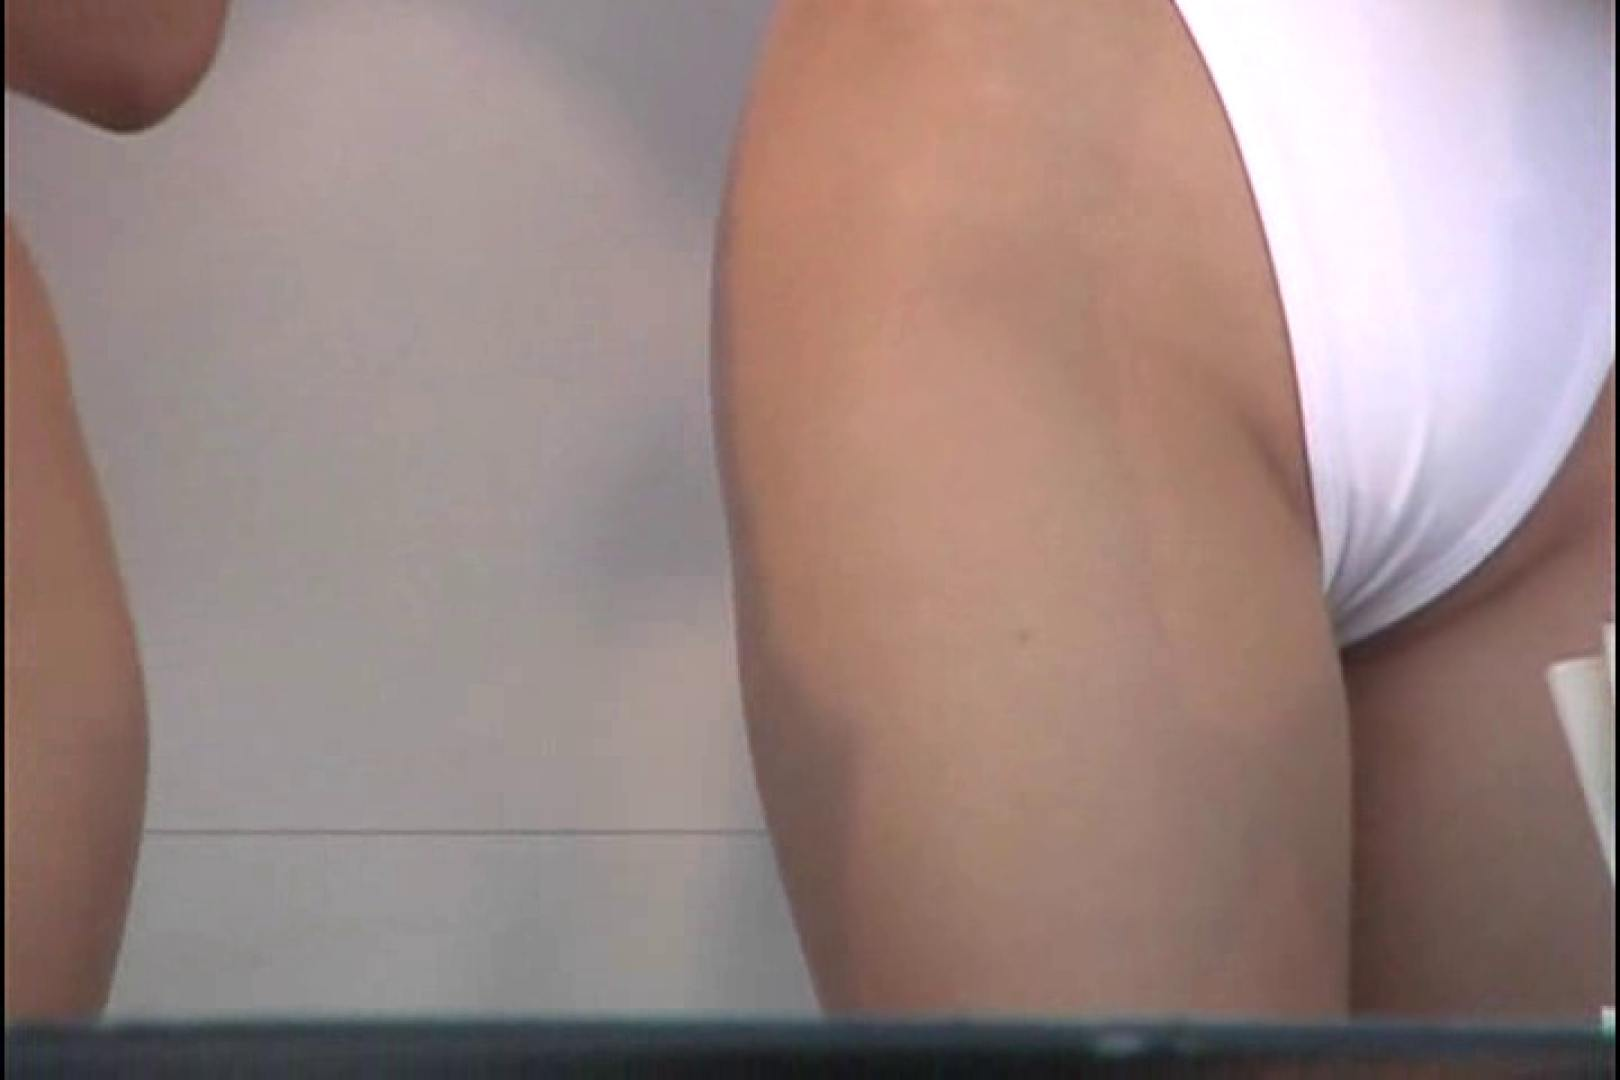 RQカメラ地獄Vol.10 望遠 盗み撮りオマンコ動画キャプチャ 74連発 62